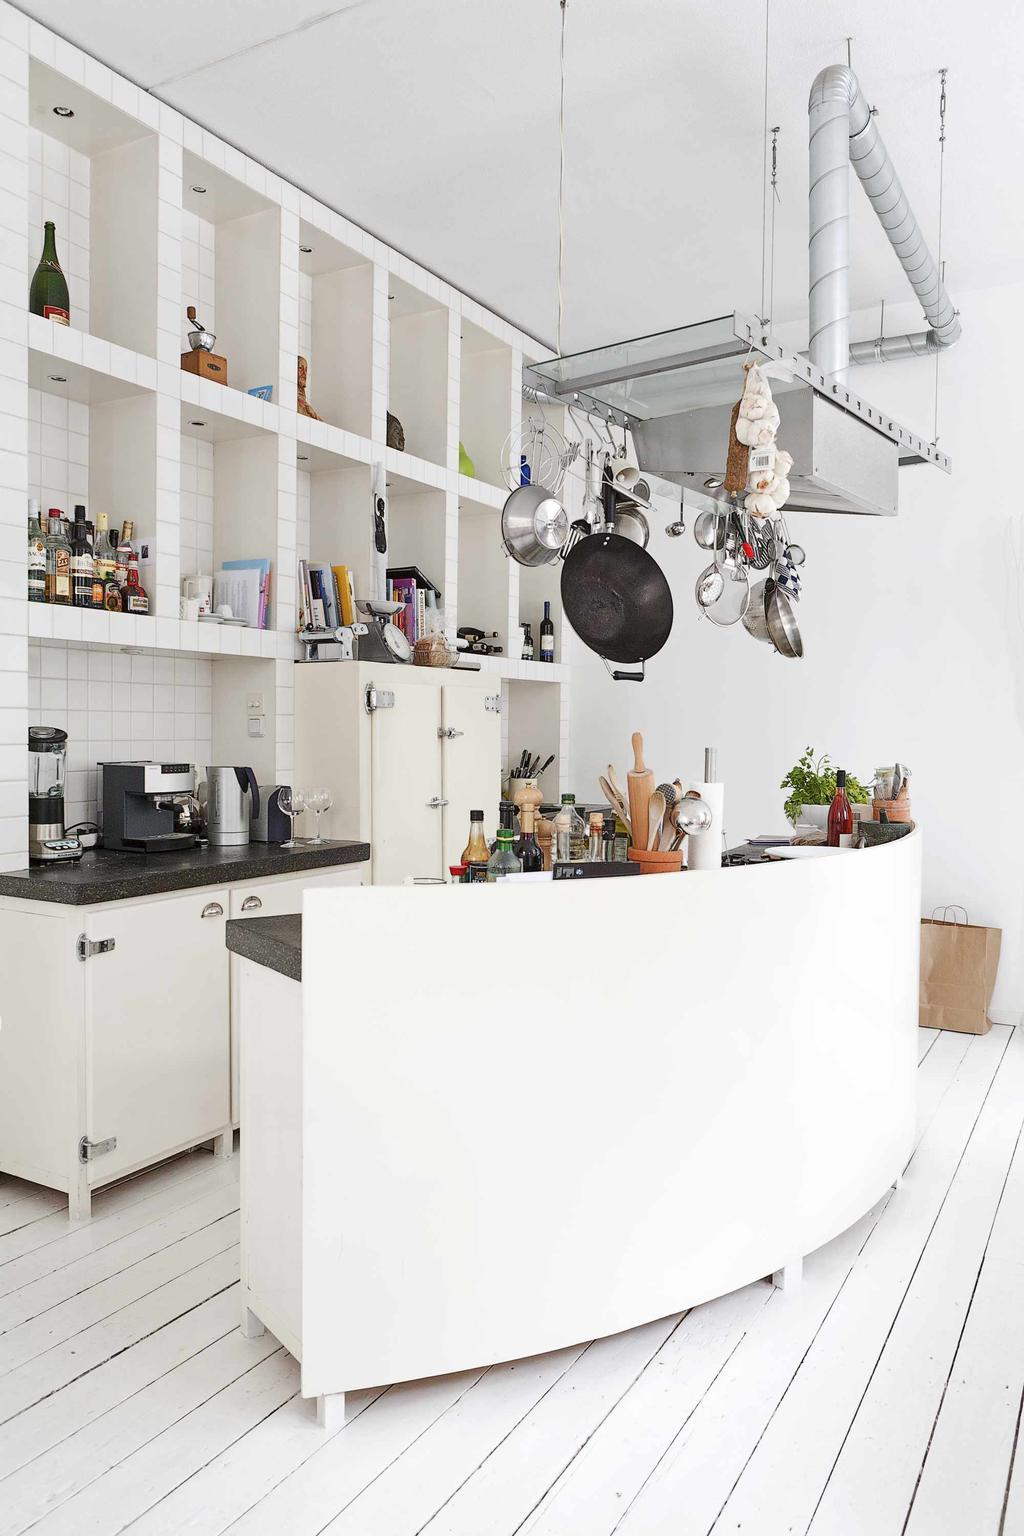 Rond keukenblok